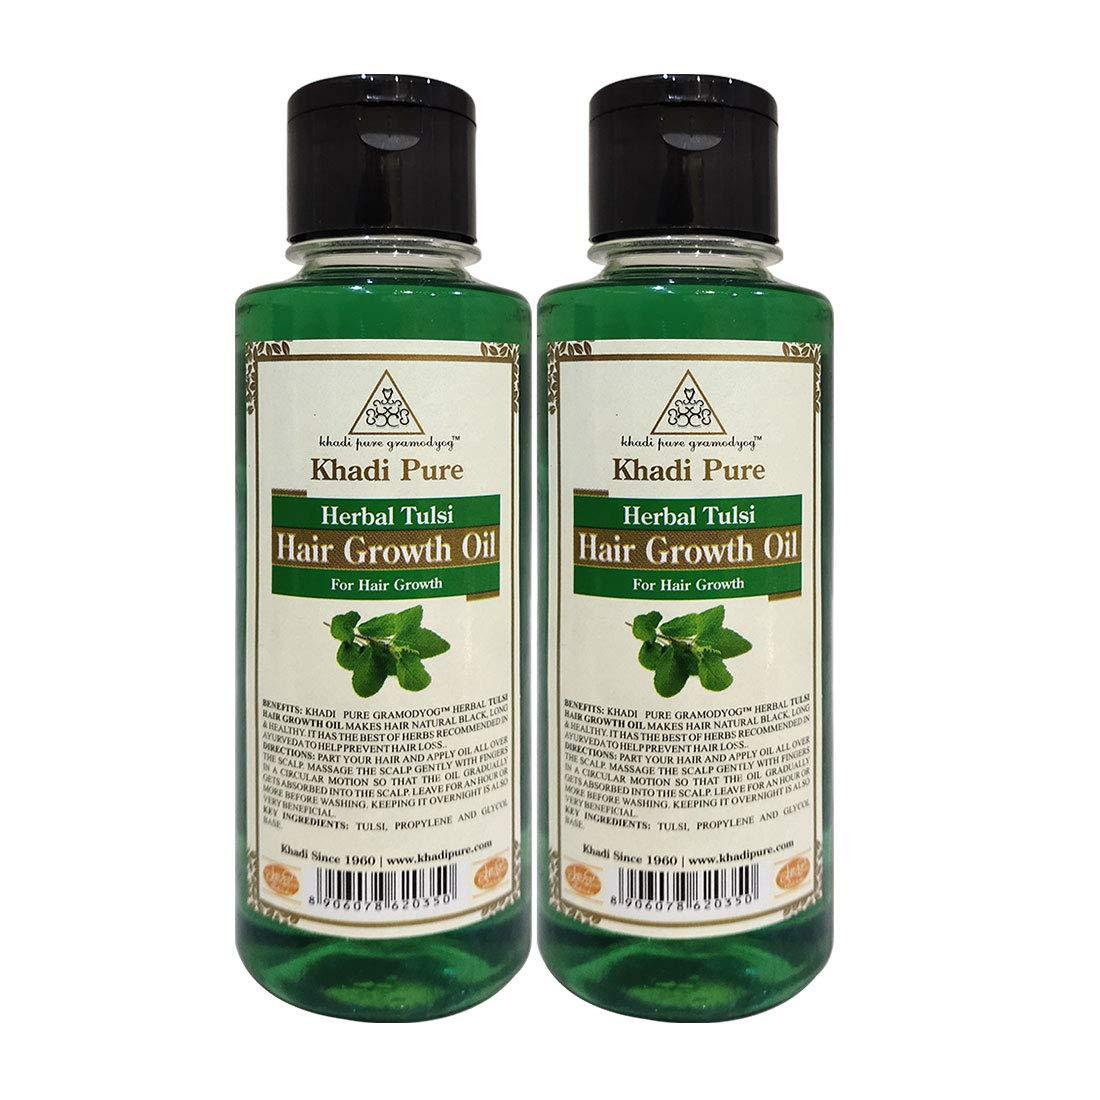 Khadi Pure Herbal Tulsi Hair Growth Oil, 45 ml (Pack of 45)